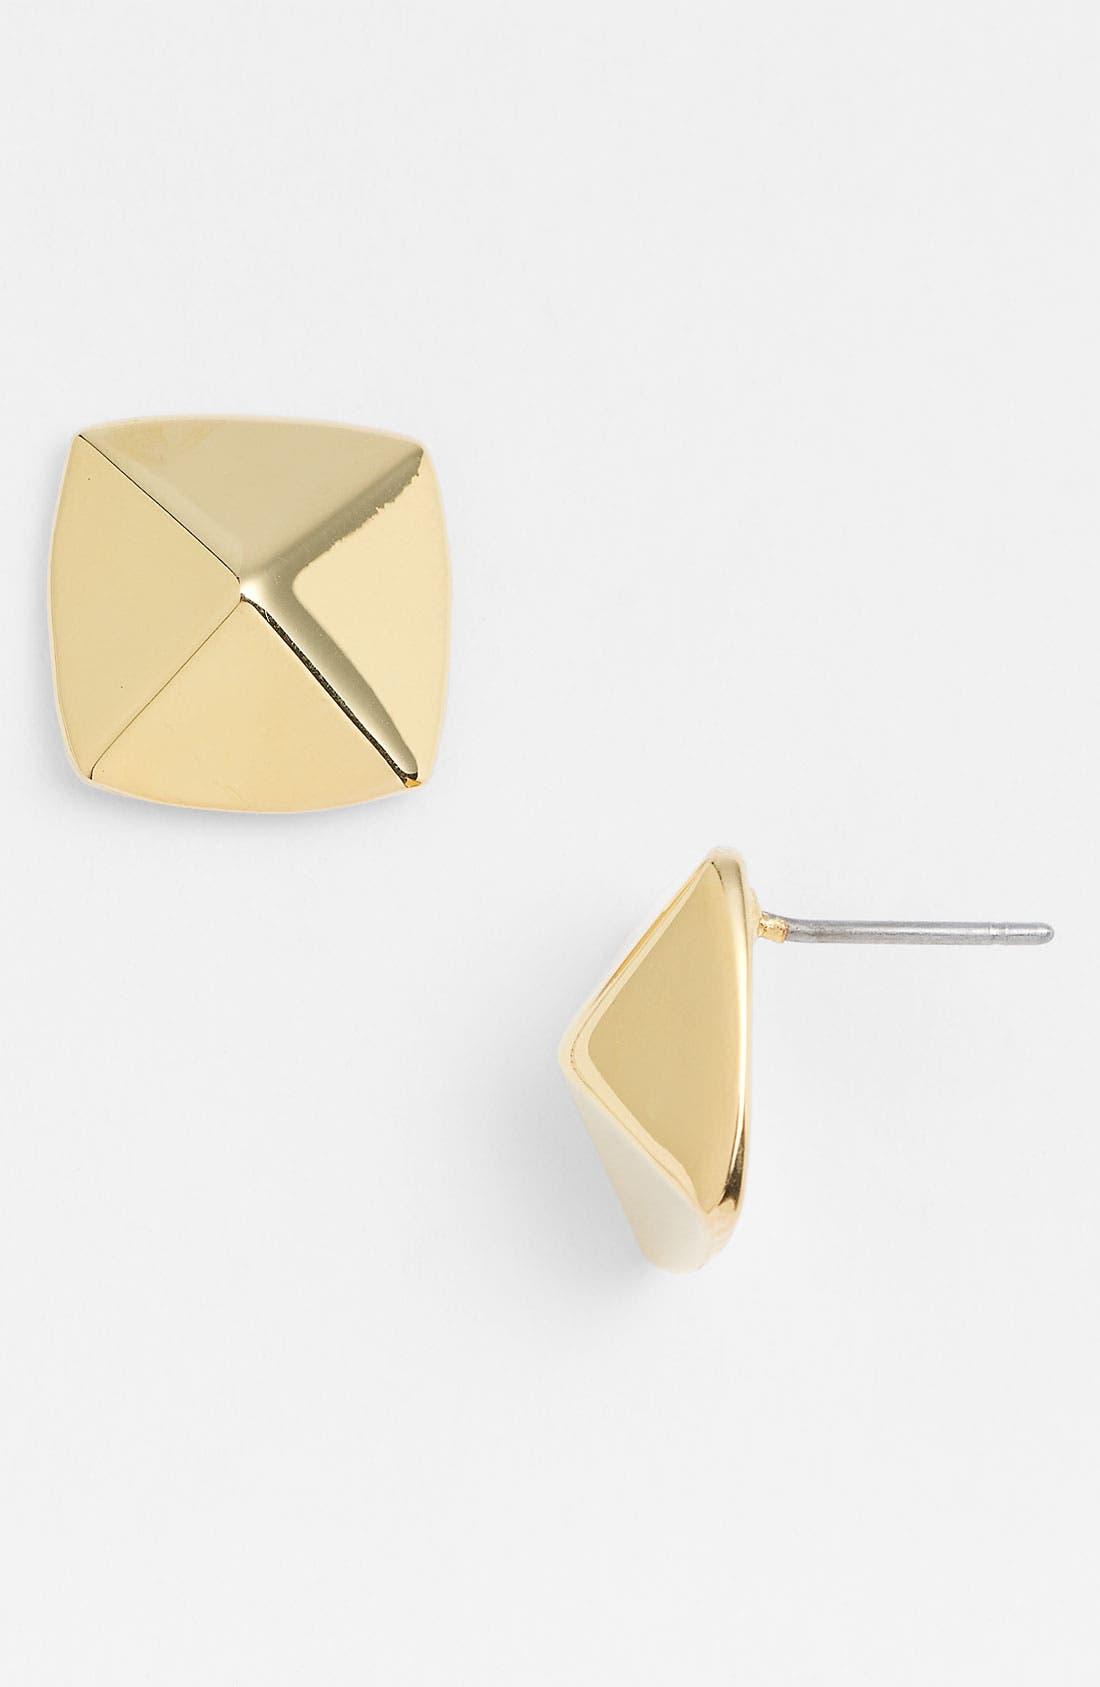 Alternate Image 1 Selected - Vince Camuto 'Basics' Small Pyramid Stud Earrings